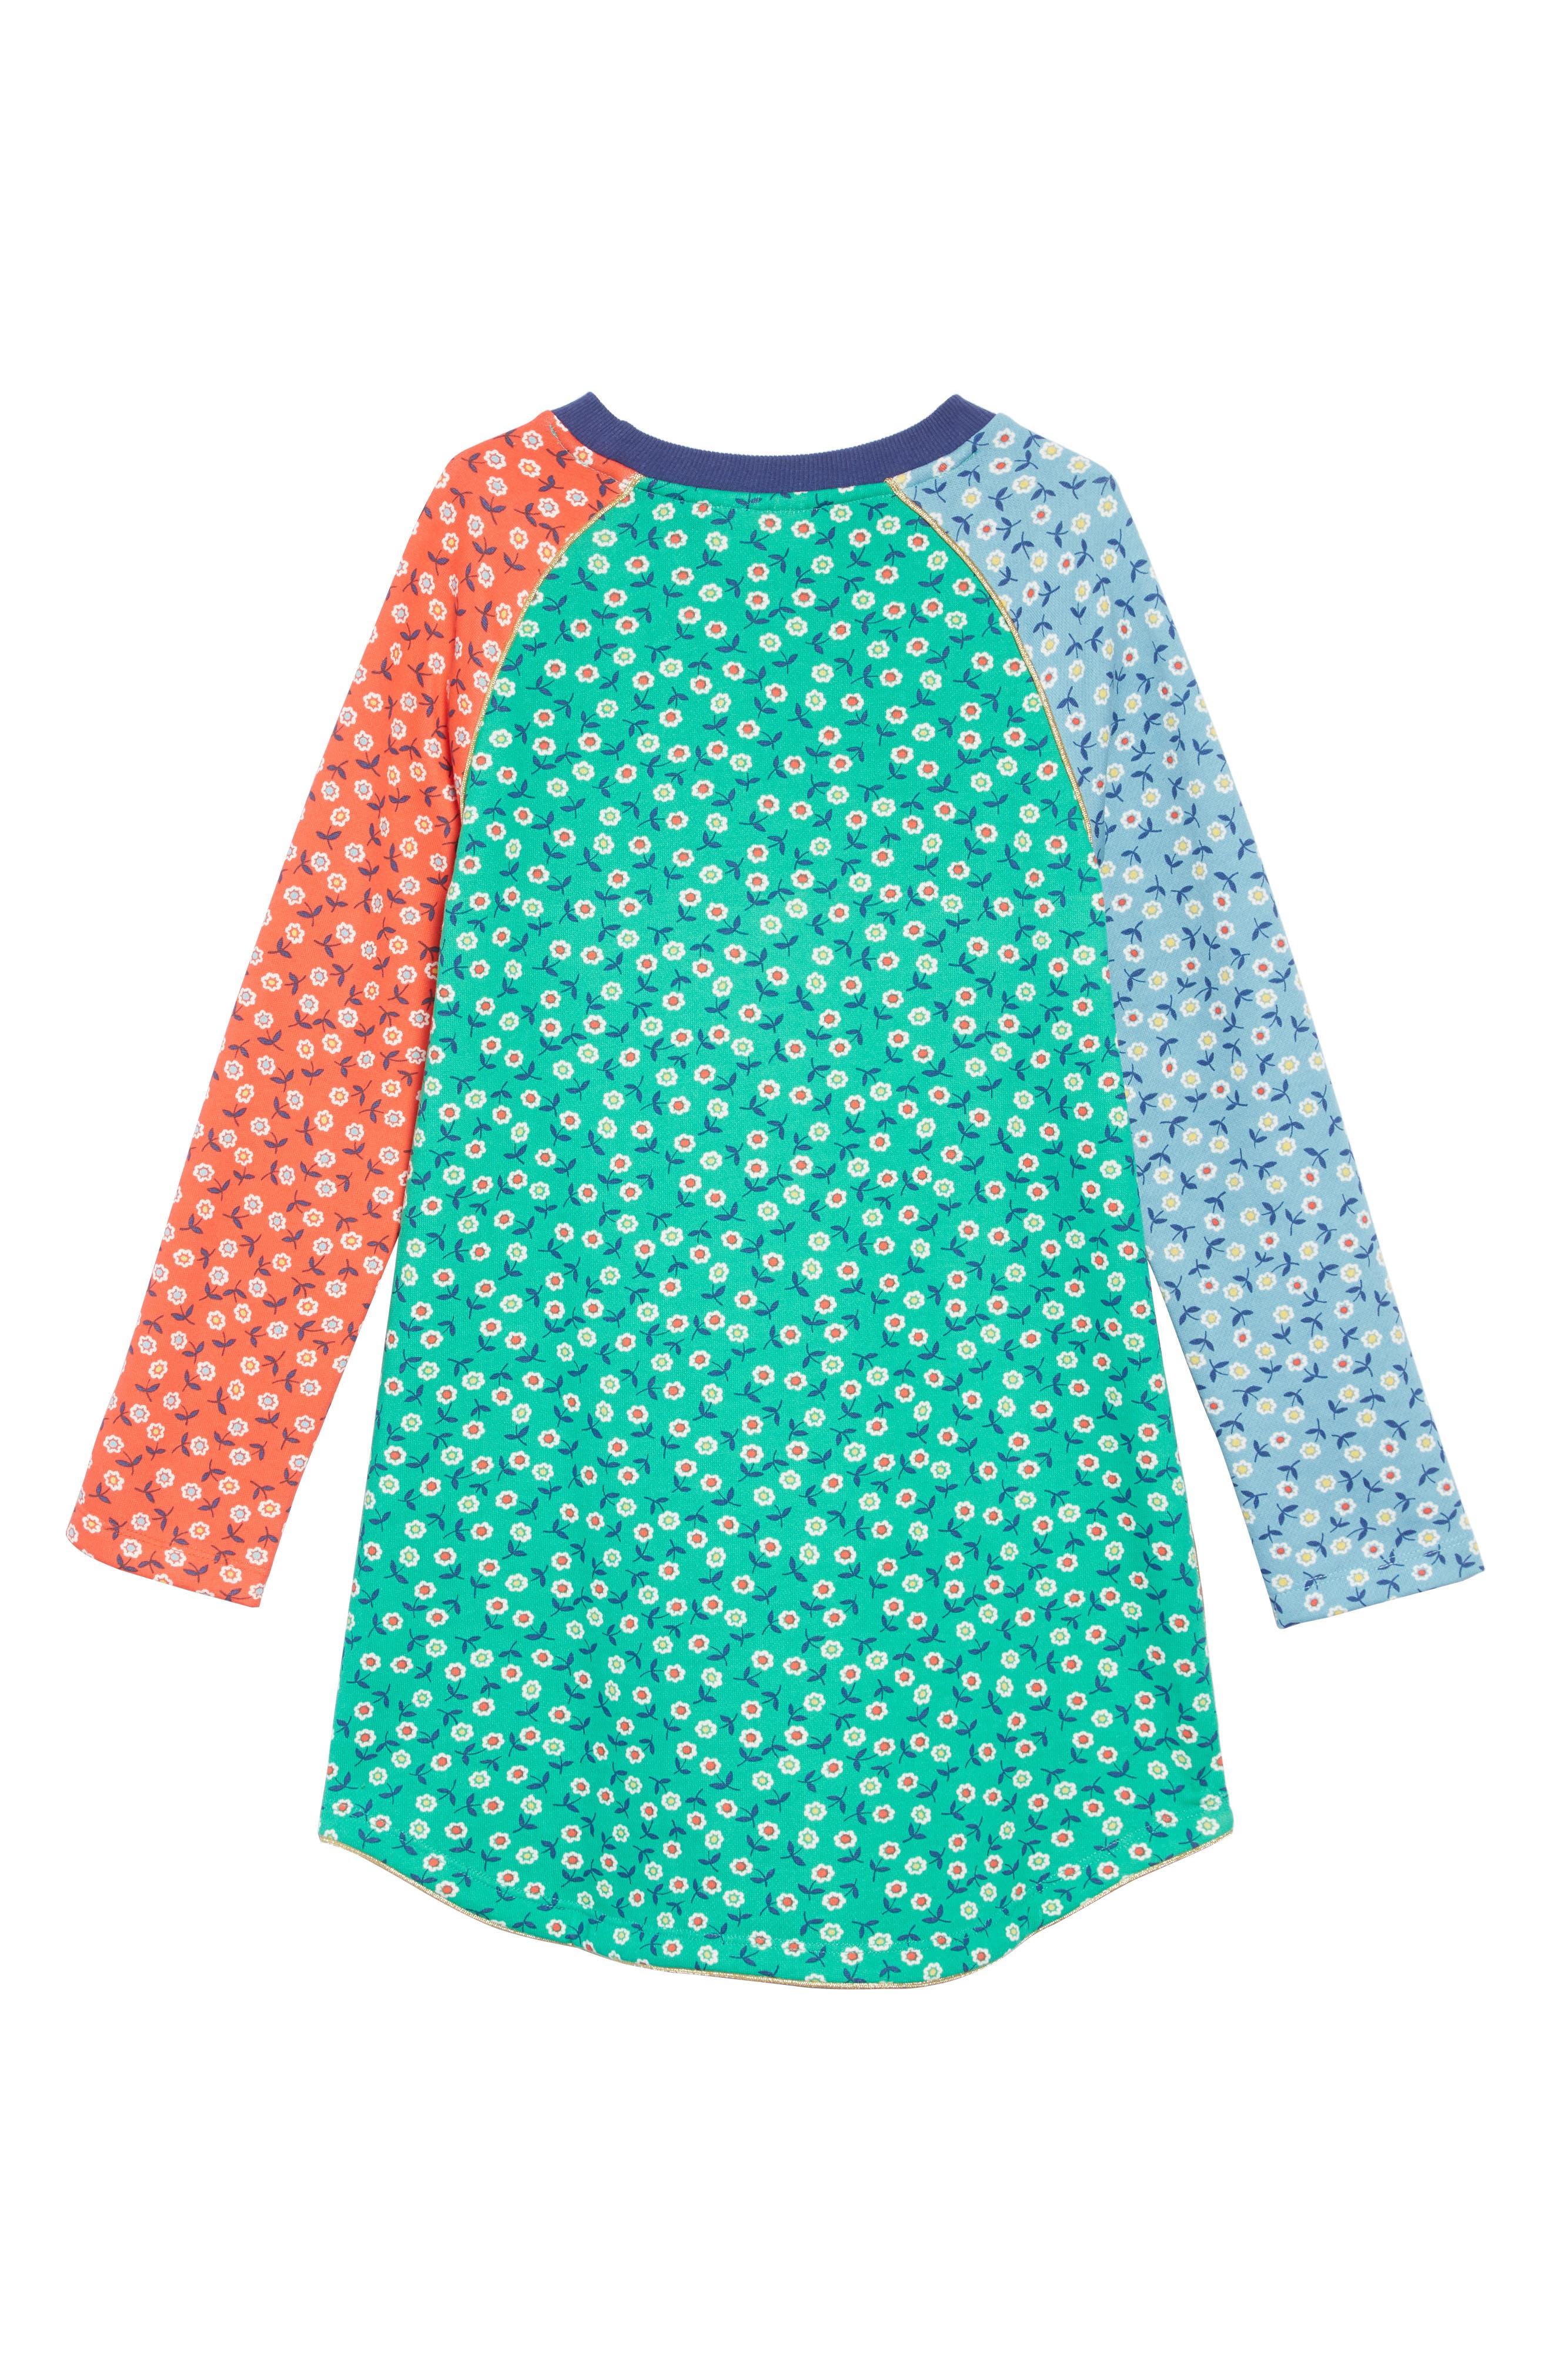 Cozy Sweatshirt Dress,                             Alternate thumbnail 2, color,                             Multi Retro Daisies